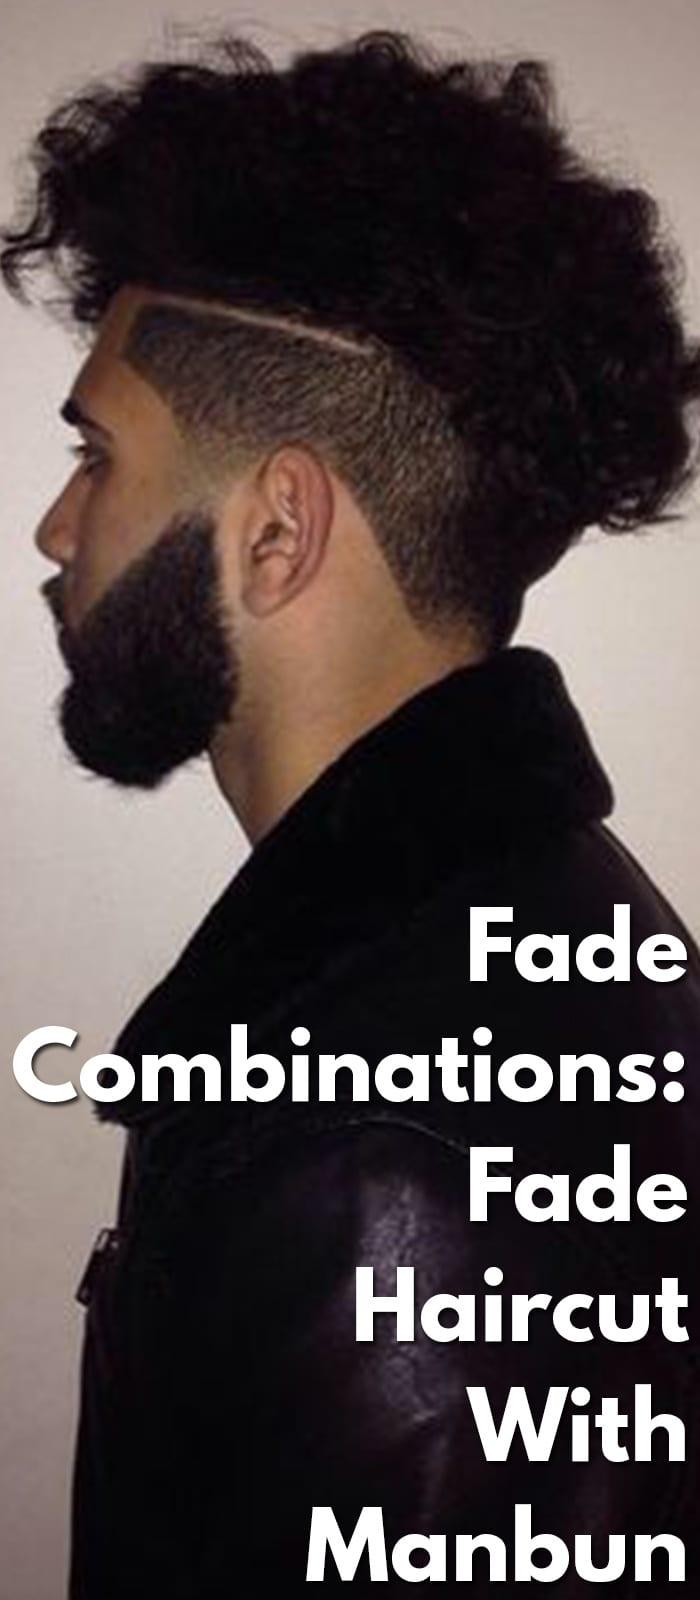 Fade-Combinations-Fade-Haircut-With-Manbun..